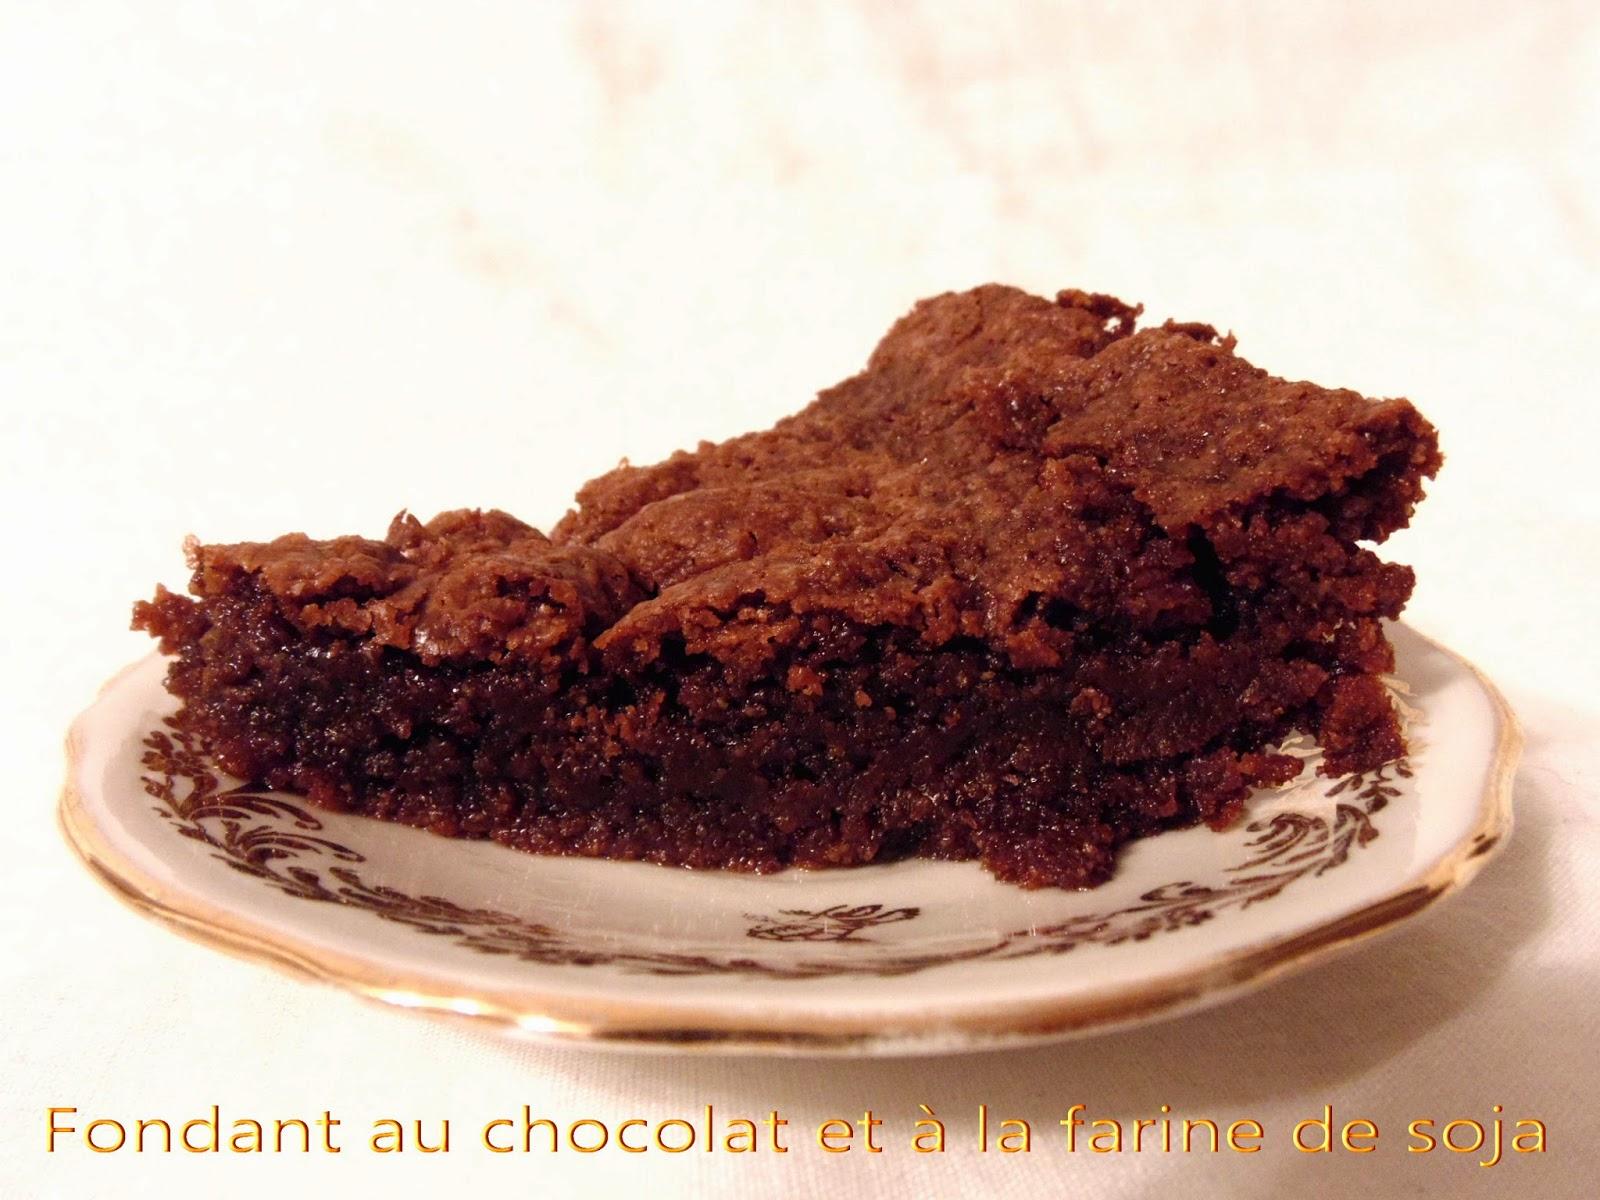 Gateau gaga love cakes fondant au chocolat et lfarine de soja sans oeuf - Fondant au chocolat sans oeuf ...